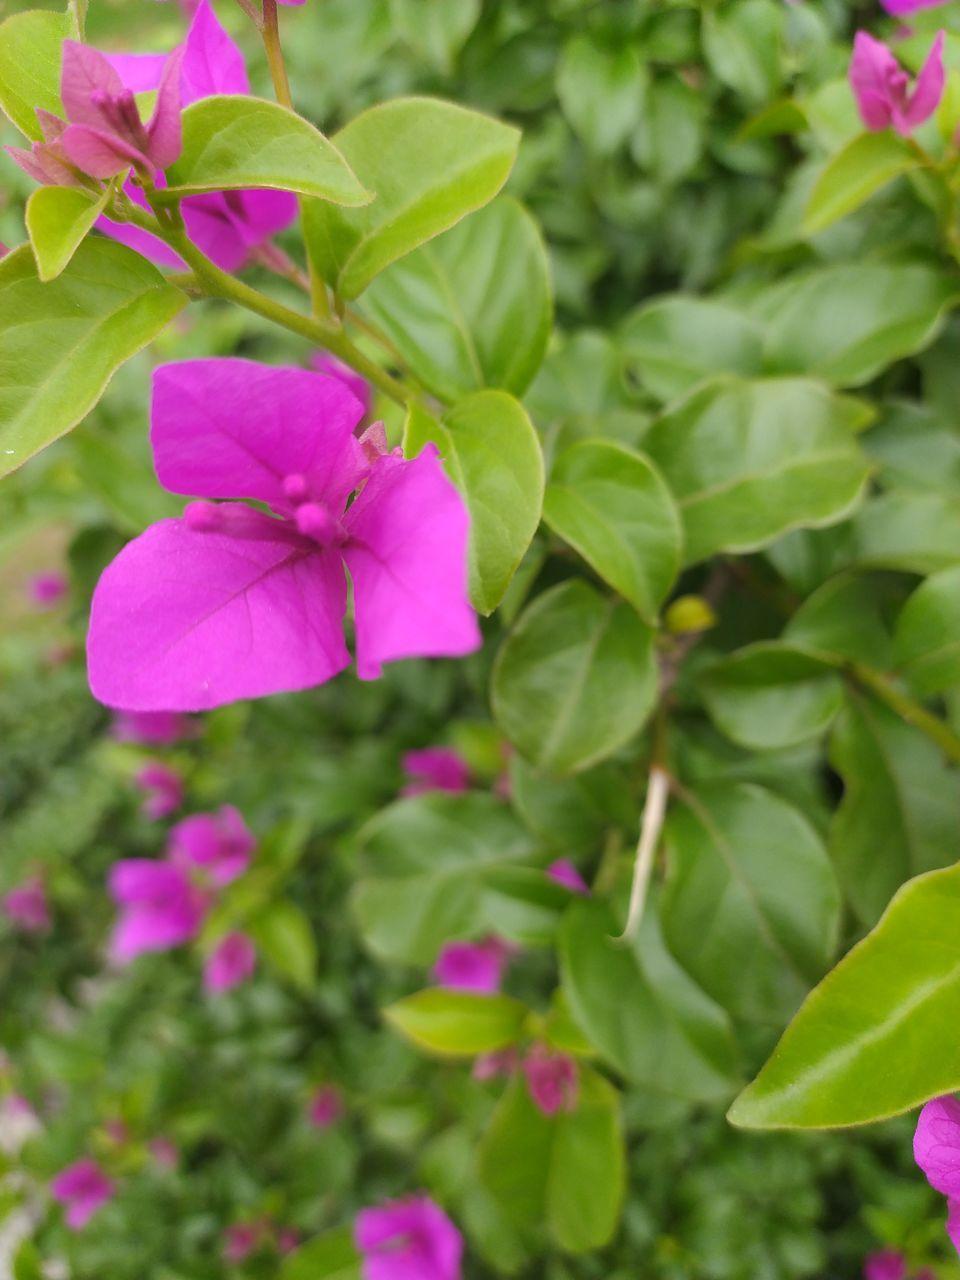 CLOSE-UP OF PURPLE FLOWERING PLANT